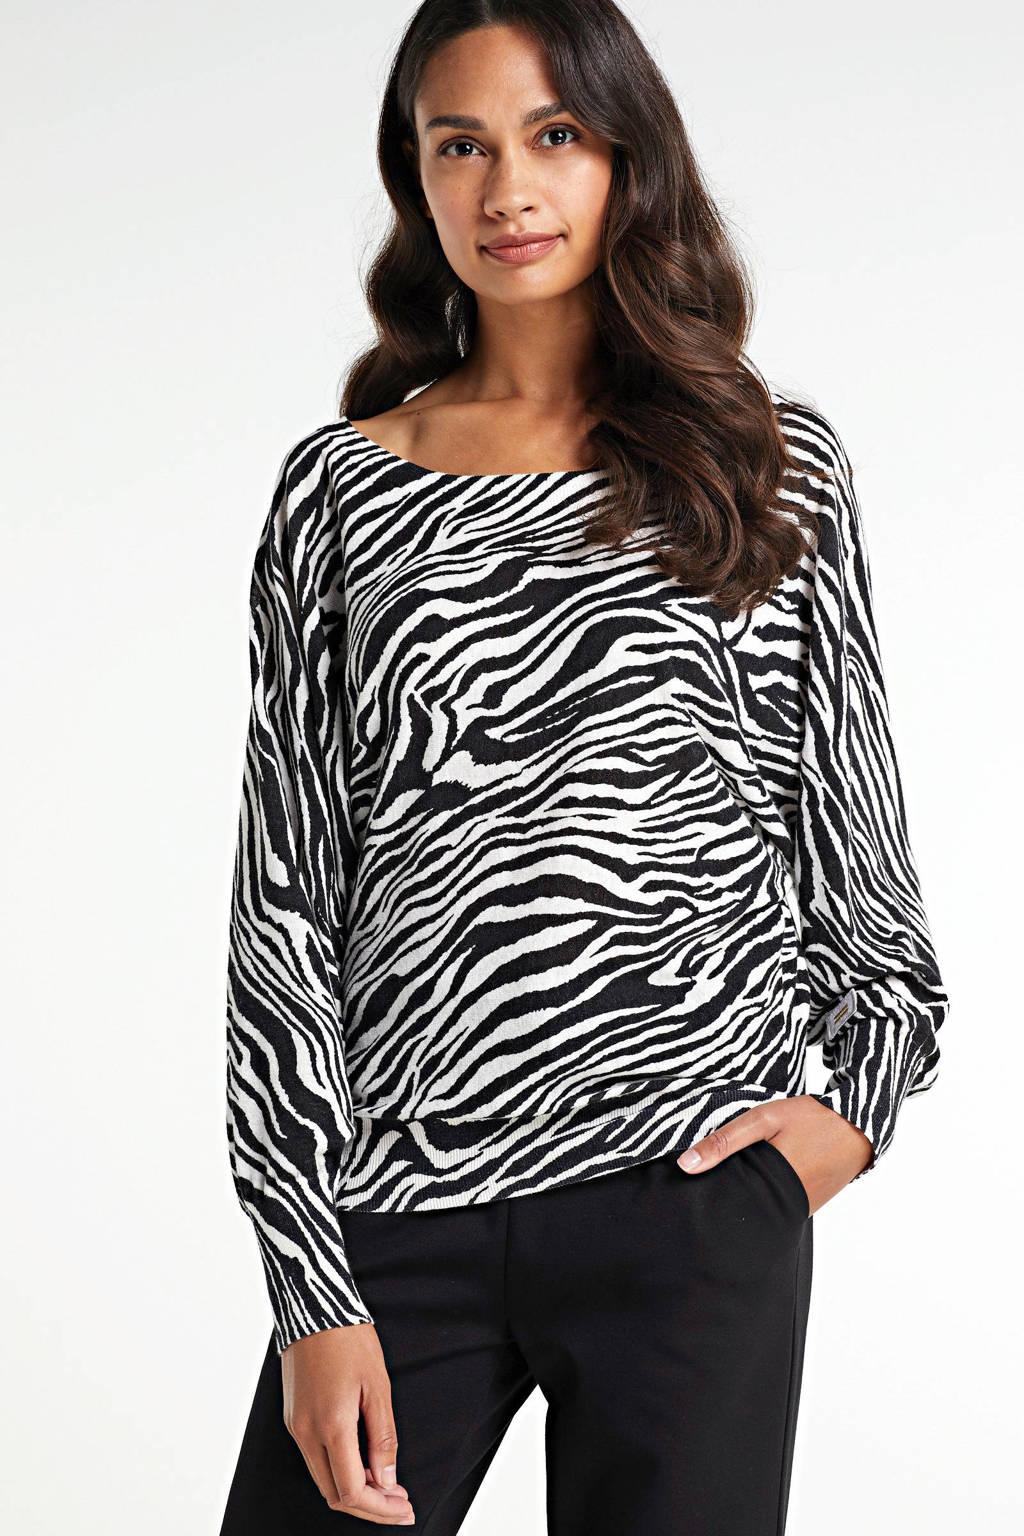 10DAYS trui met zebraprint zwart/wit, Zwart/wit